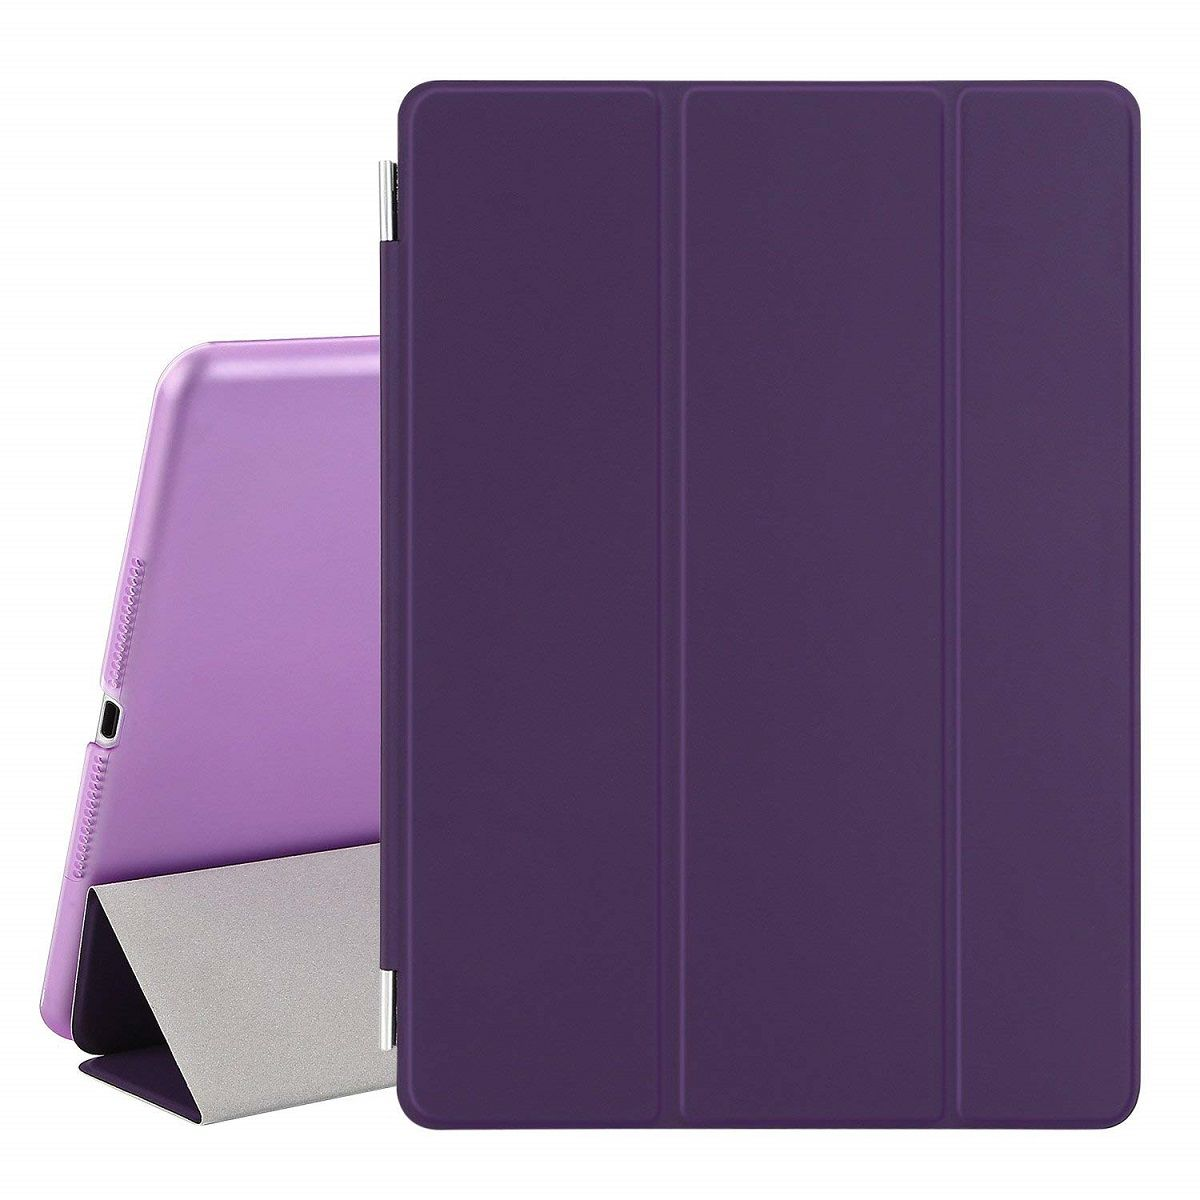 Capa Smart Case Ipad Air 2 Sensor Sleep Frontal + Traseira